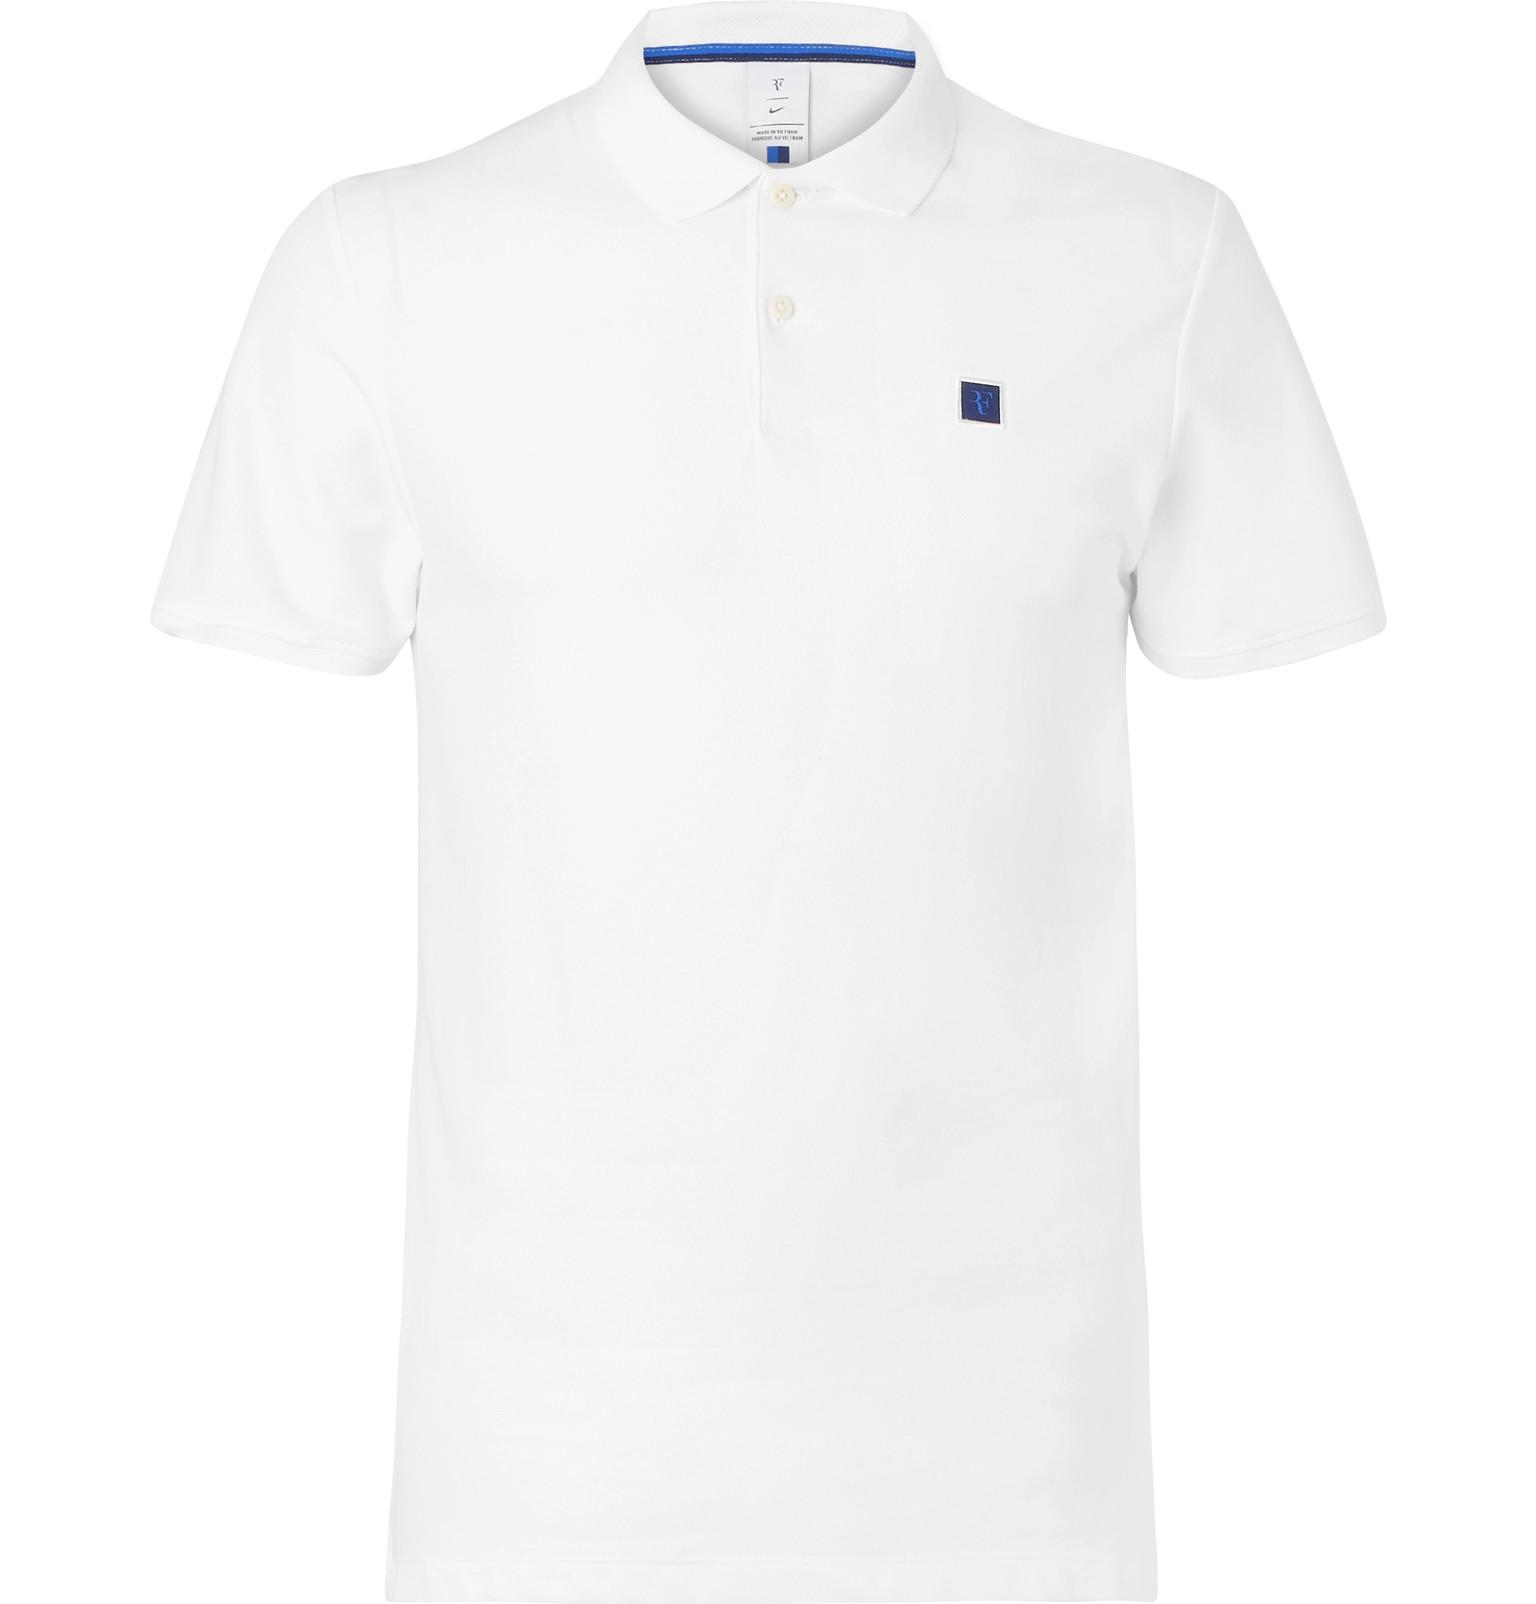 a21e0523 Nike Nikecourt Roger Federer Essential Cotton-blend Piqué Polo Shirt ...